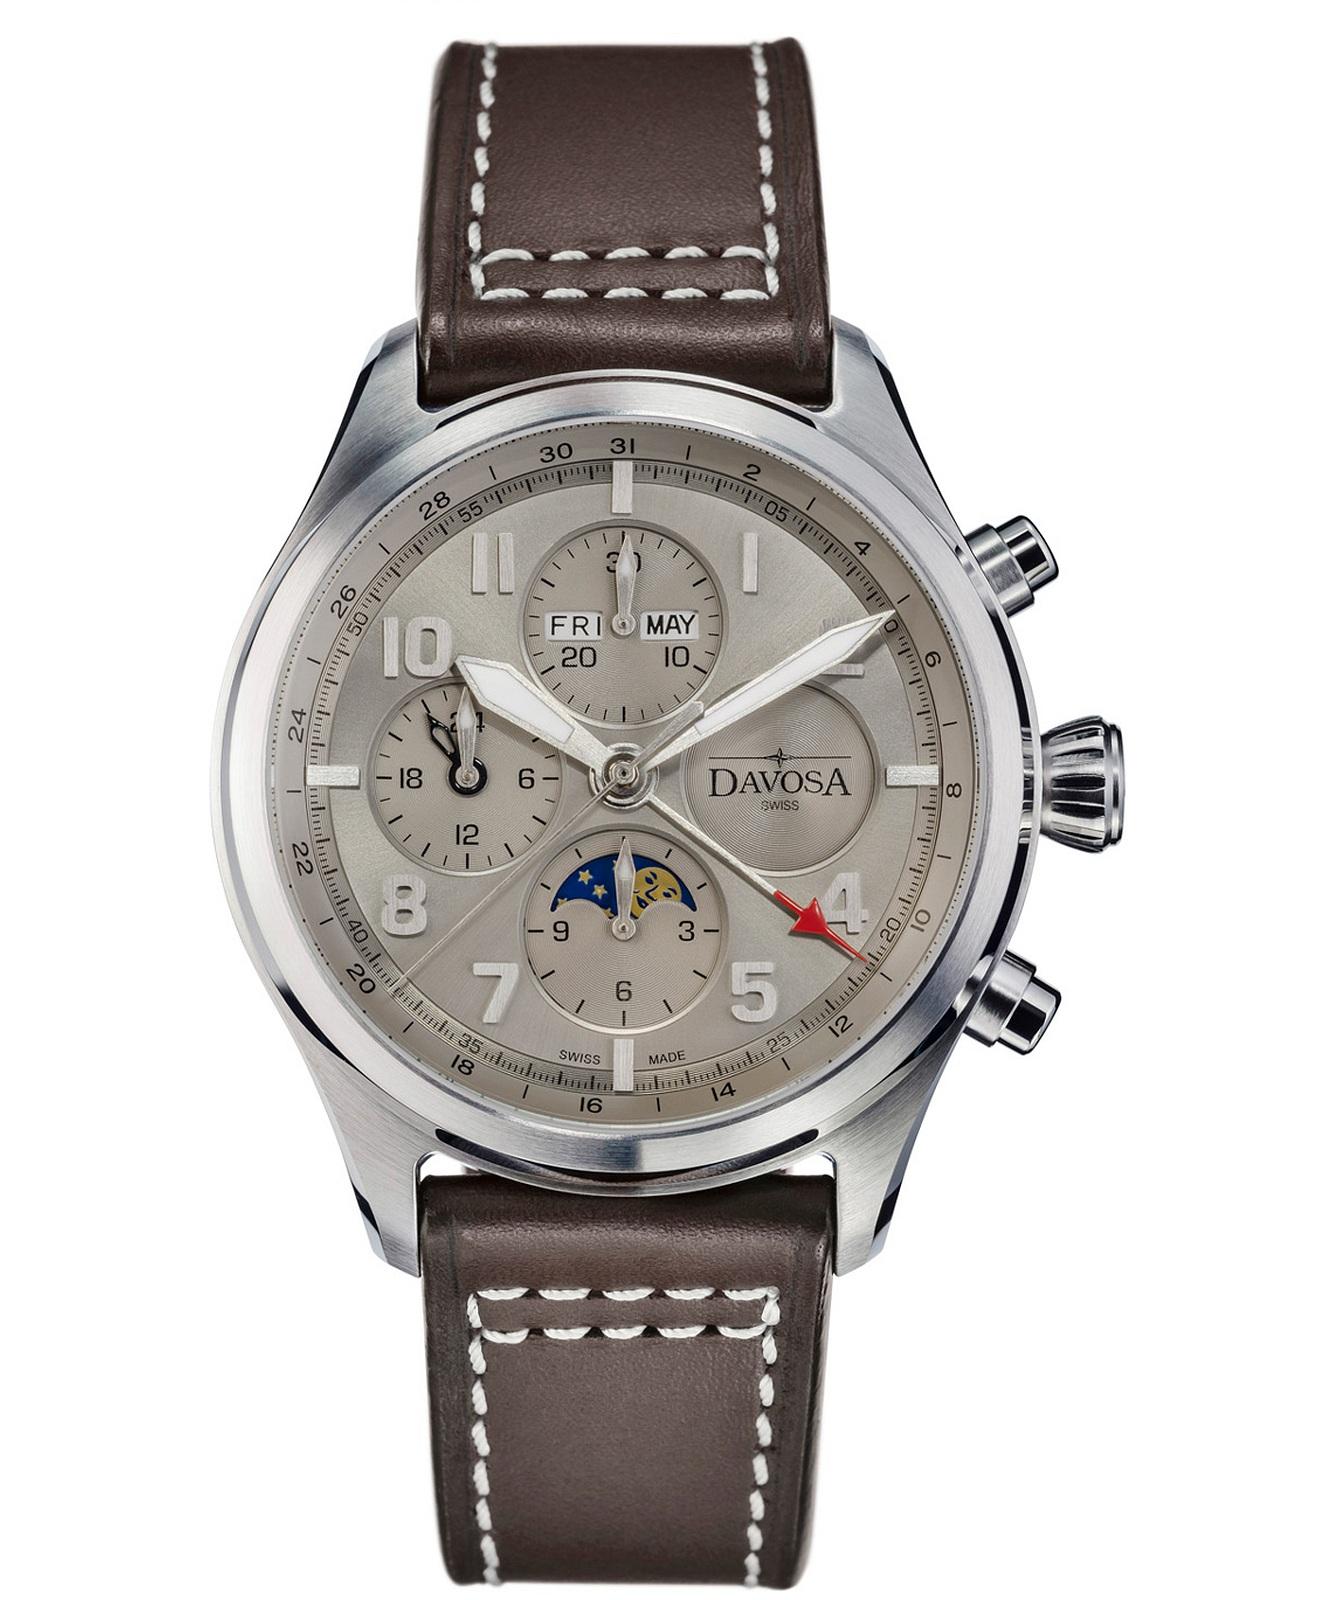 zegarek-meski-davosa-newton-pilot-moonphase-automatic-valjoux-chronograph-limited-161-586-15_001